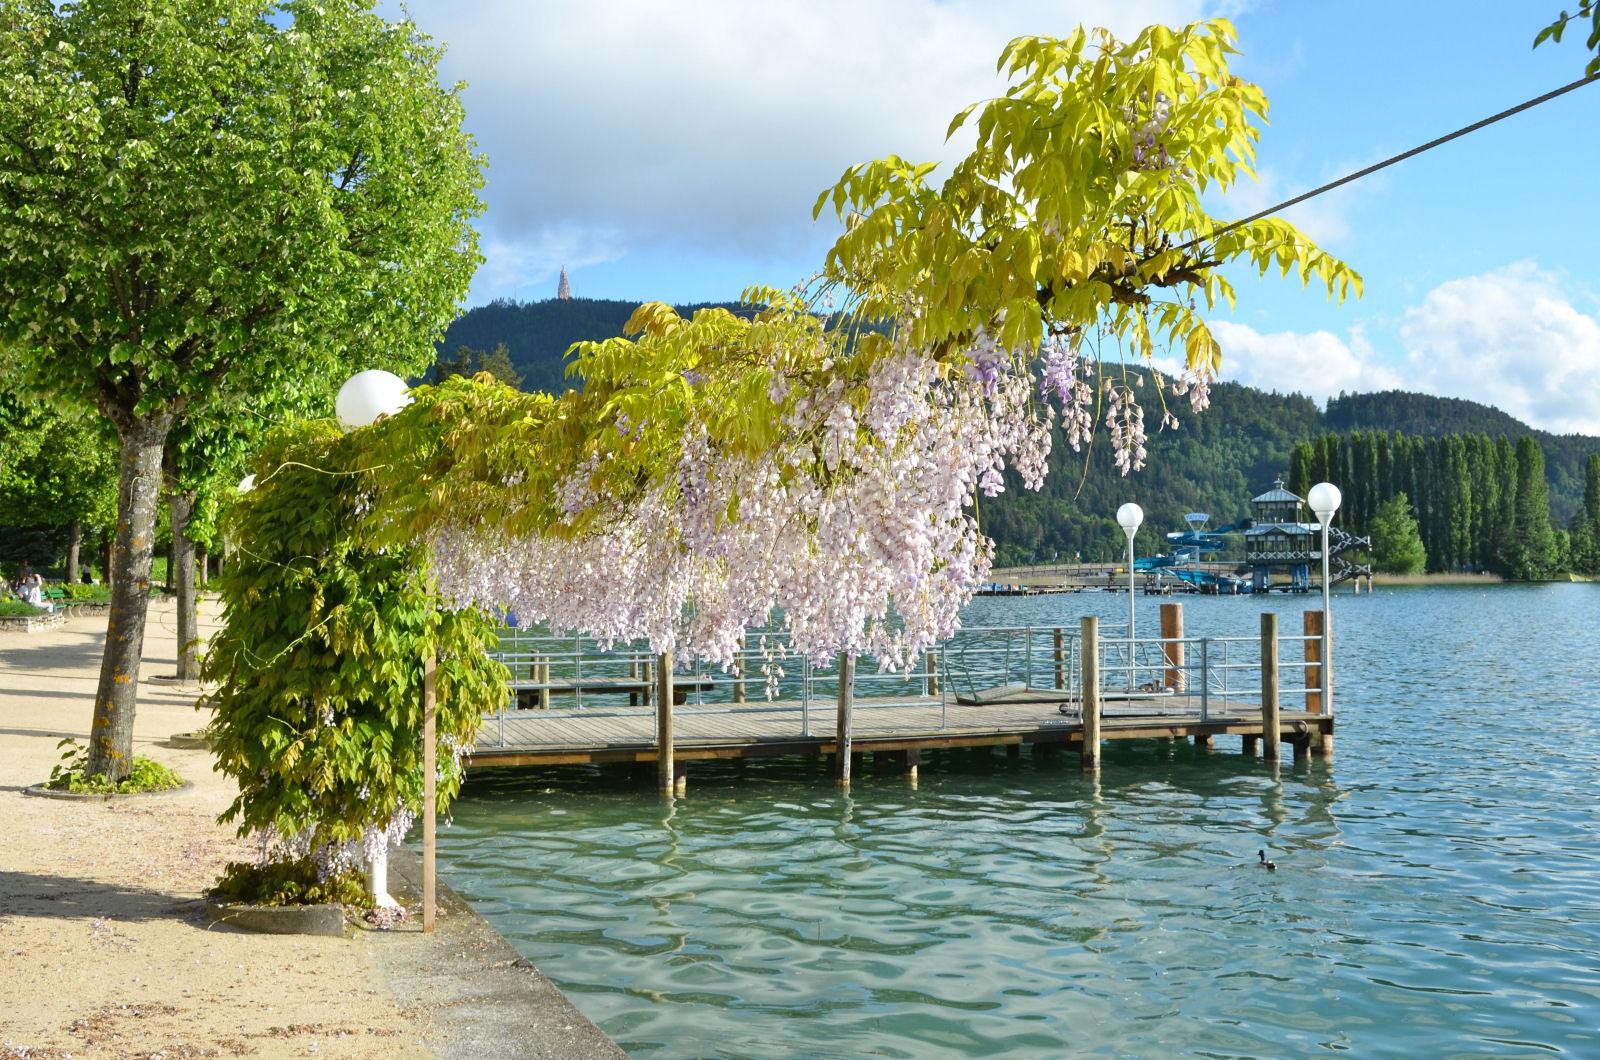 lake-woerthersee-wisteria-promenade-austria